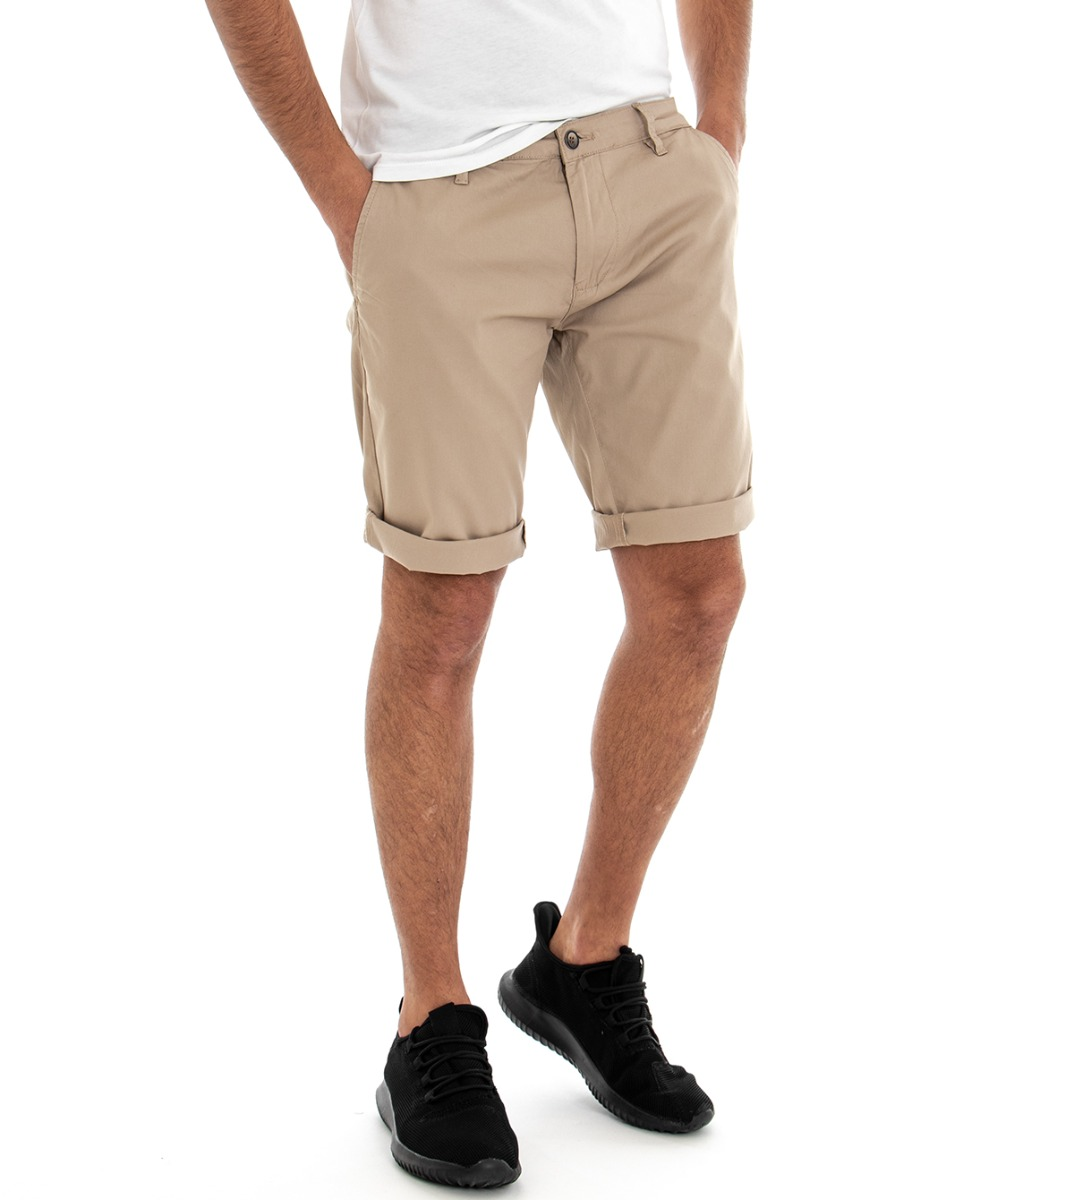 Pantalone Corto Uomo Bermuda Tasca America Fantasia Rombi GIOSAL